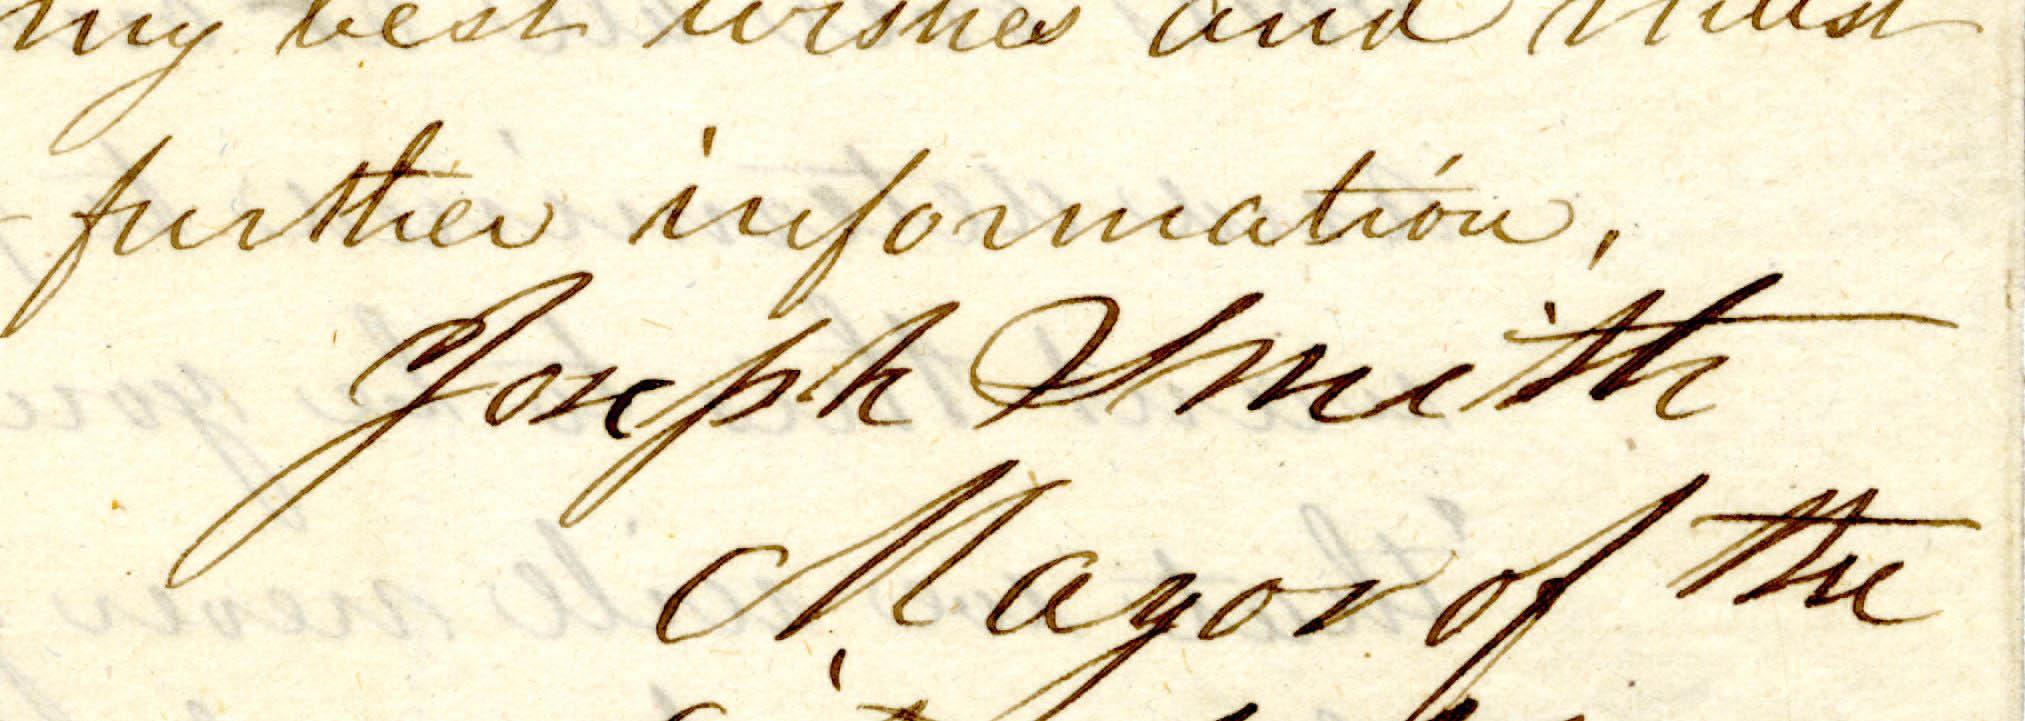 The signature of Joseph Smith.